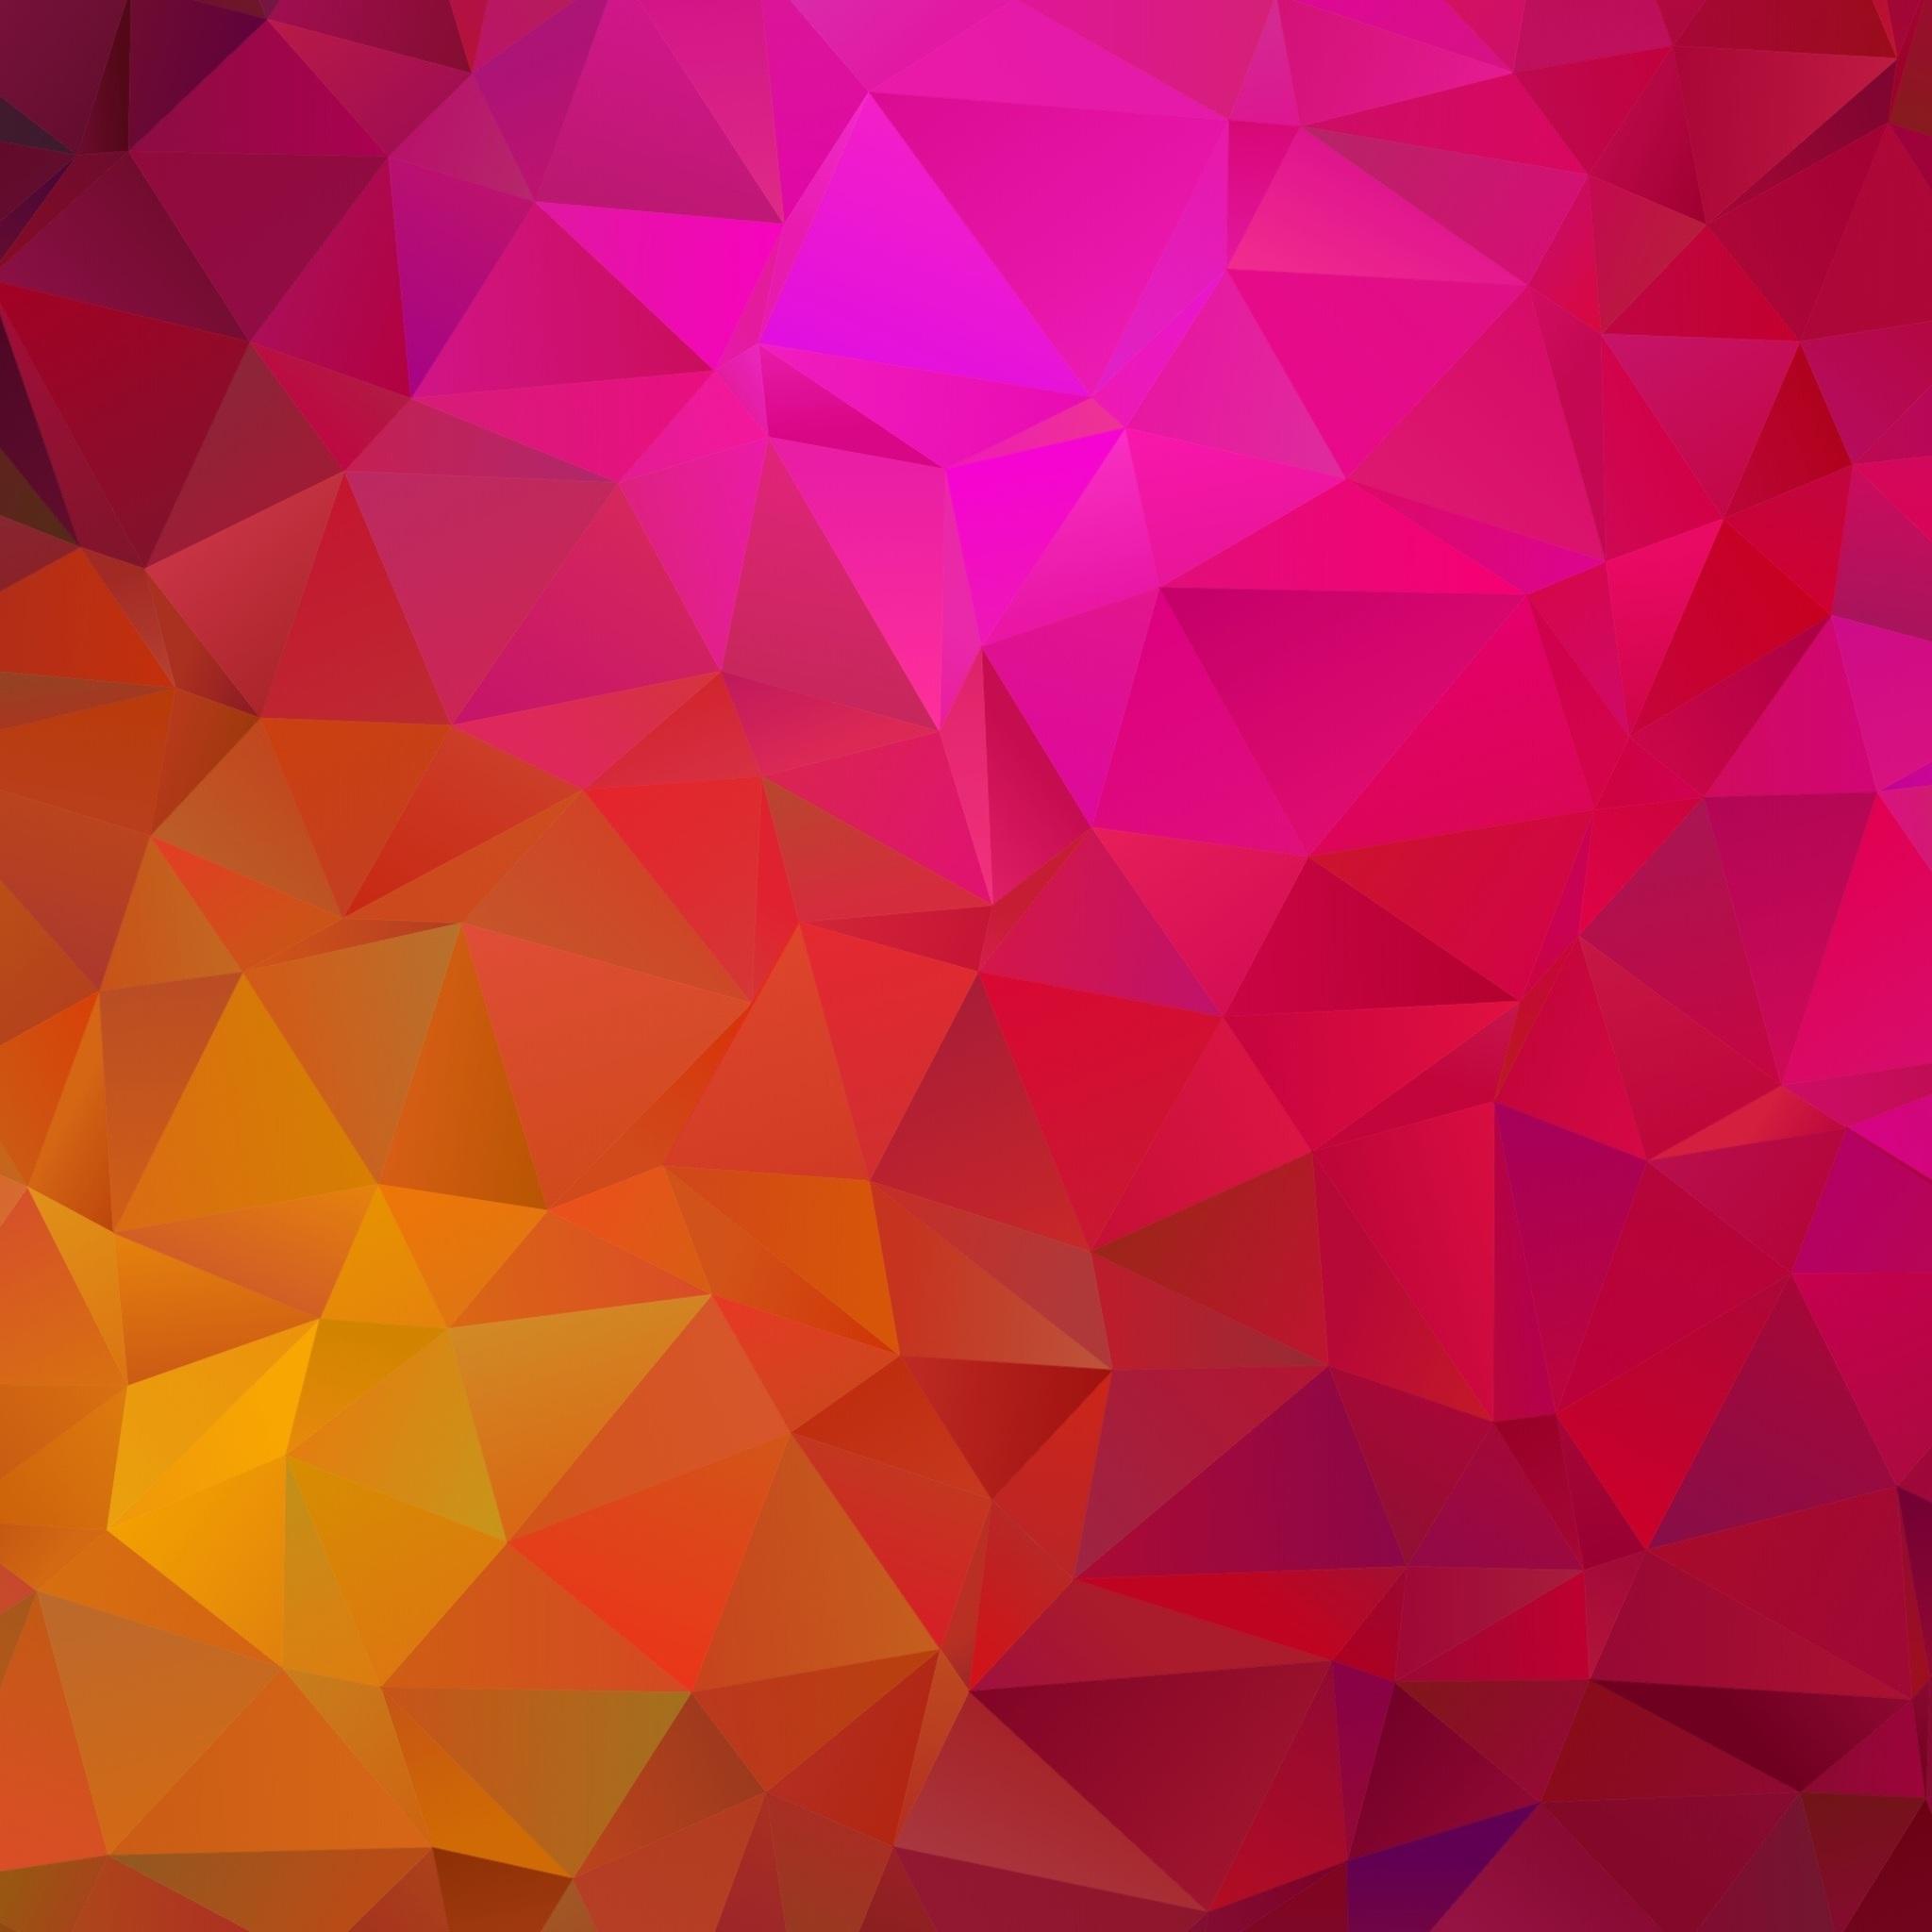 2048x2048 Triangle Geometric Abstract Ipad Air HD 4k